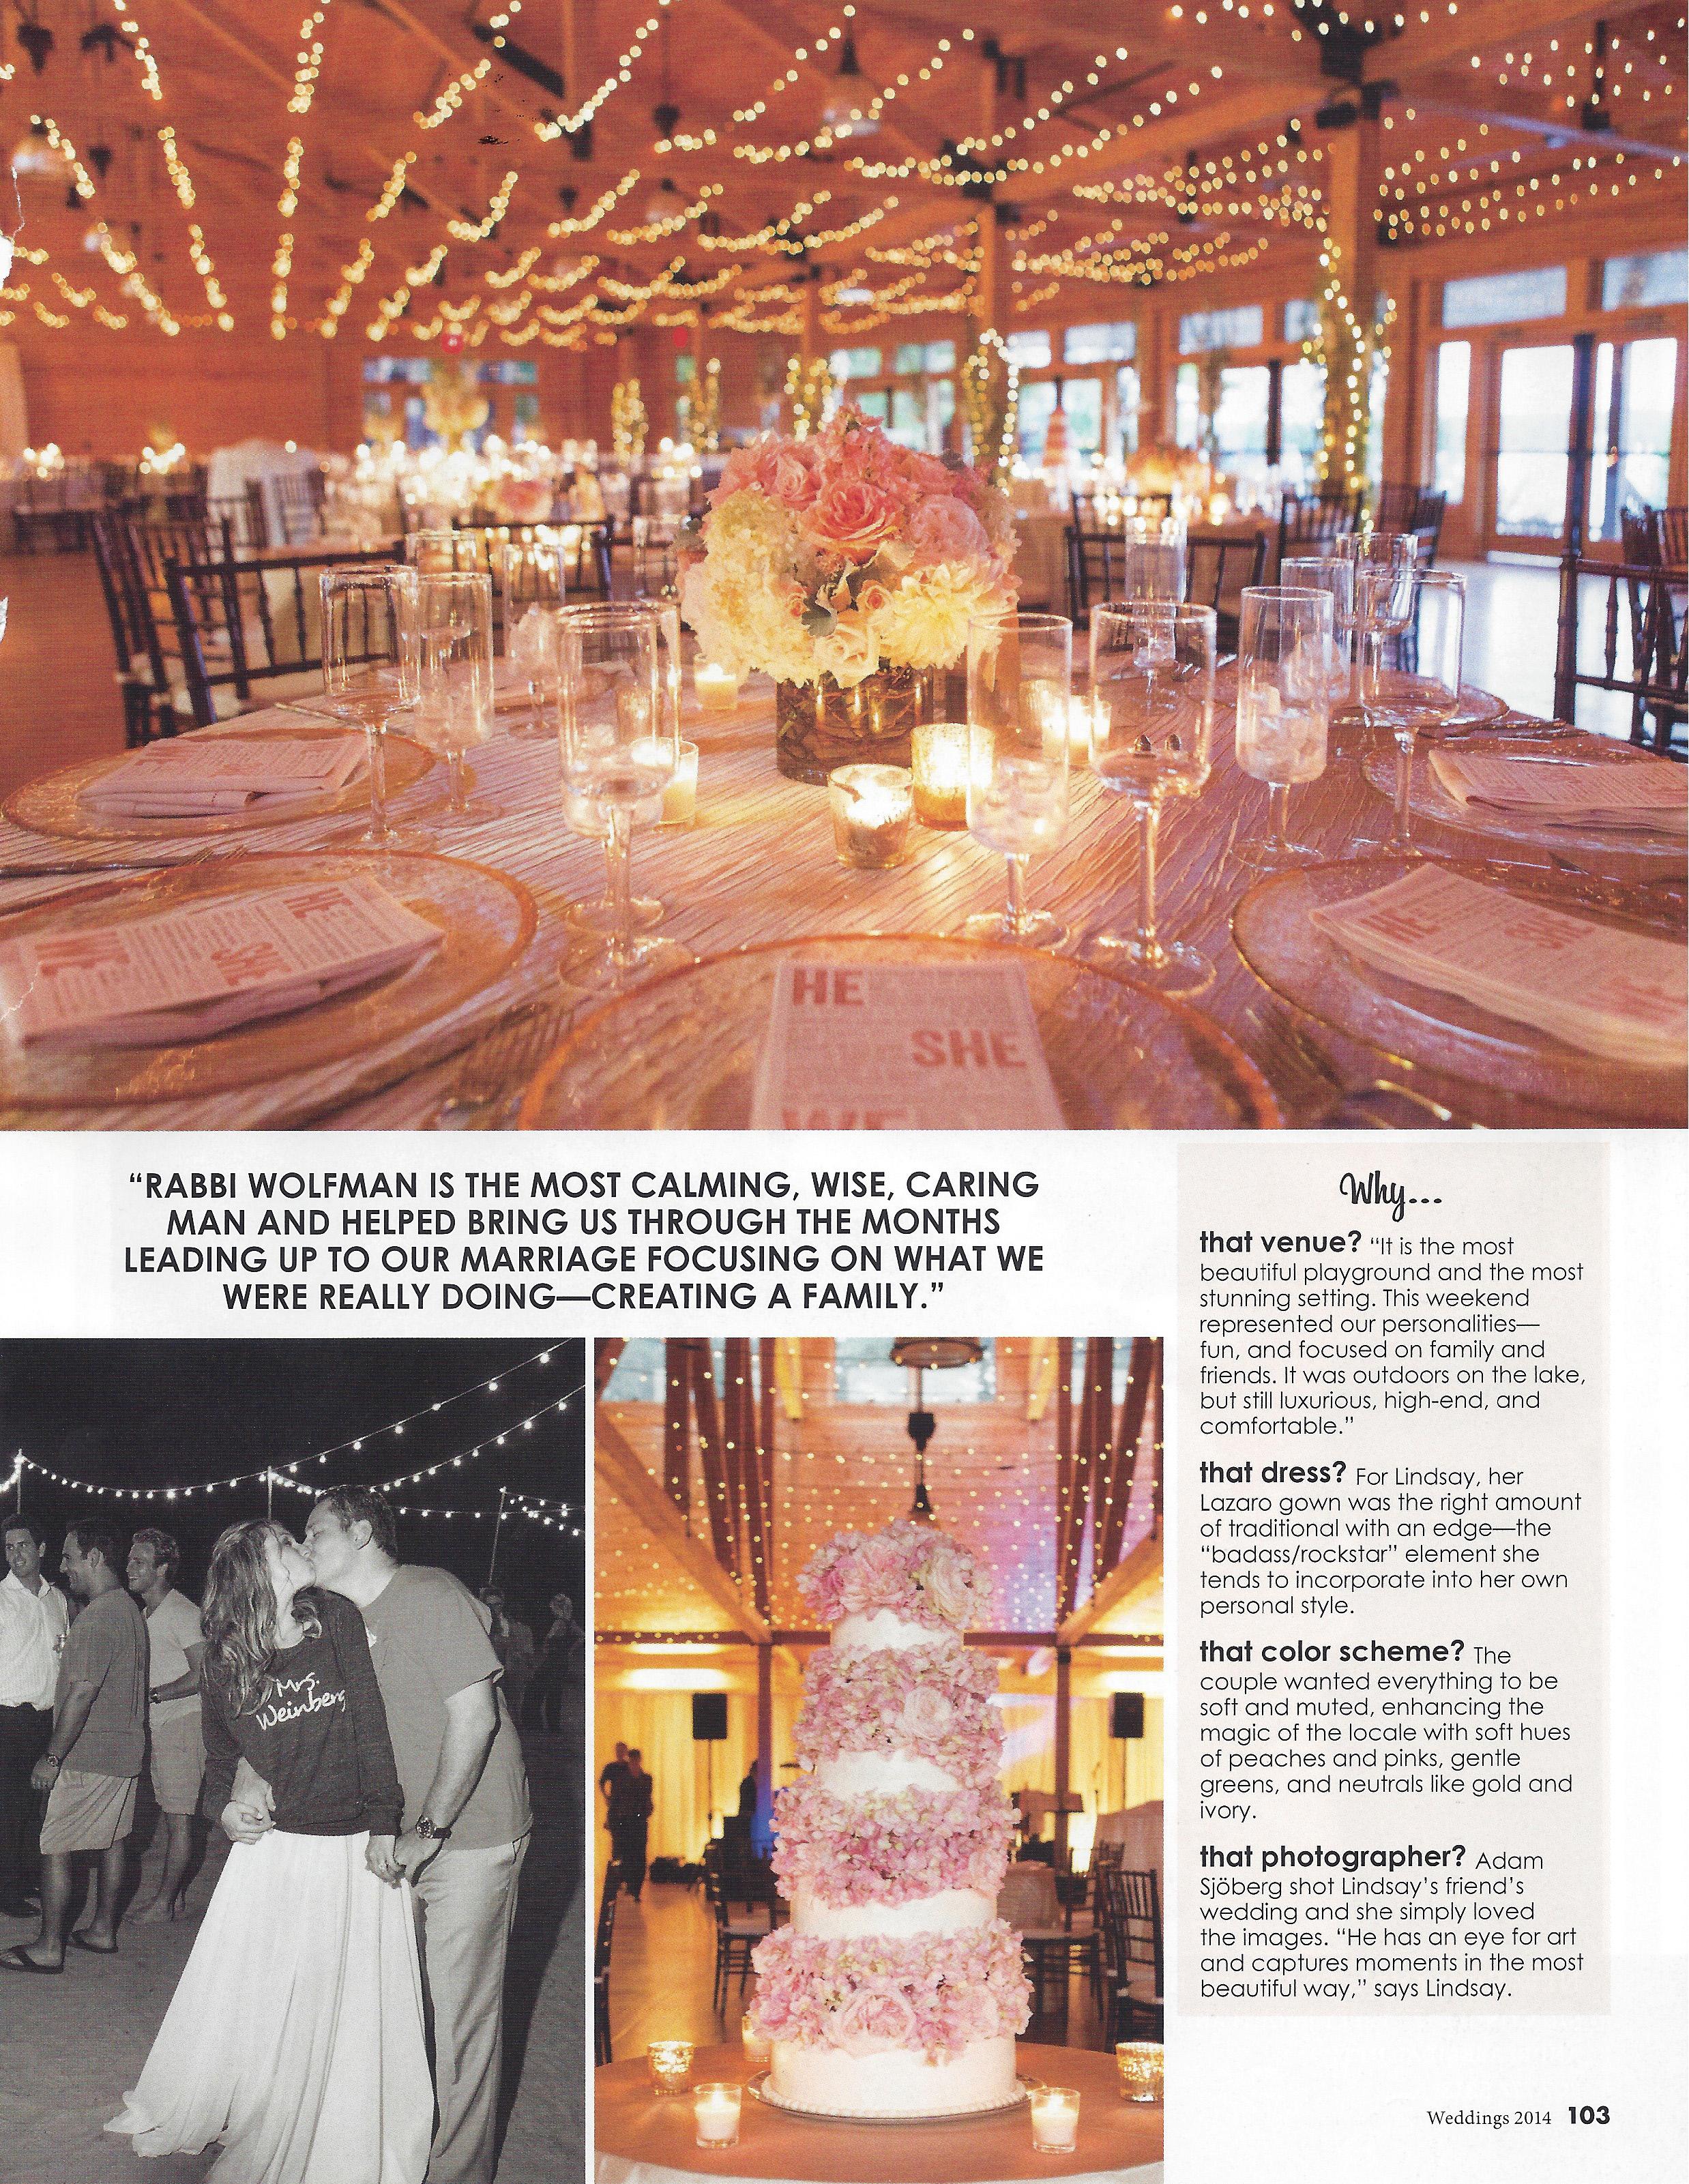 Wedding Lighting Design Maine wedding florist design  | Photo Credit: Adam Sjoberg for Ira Lippke Studios